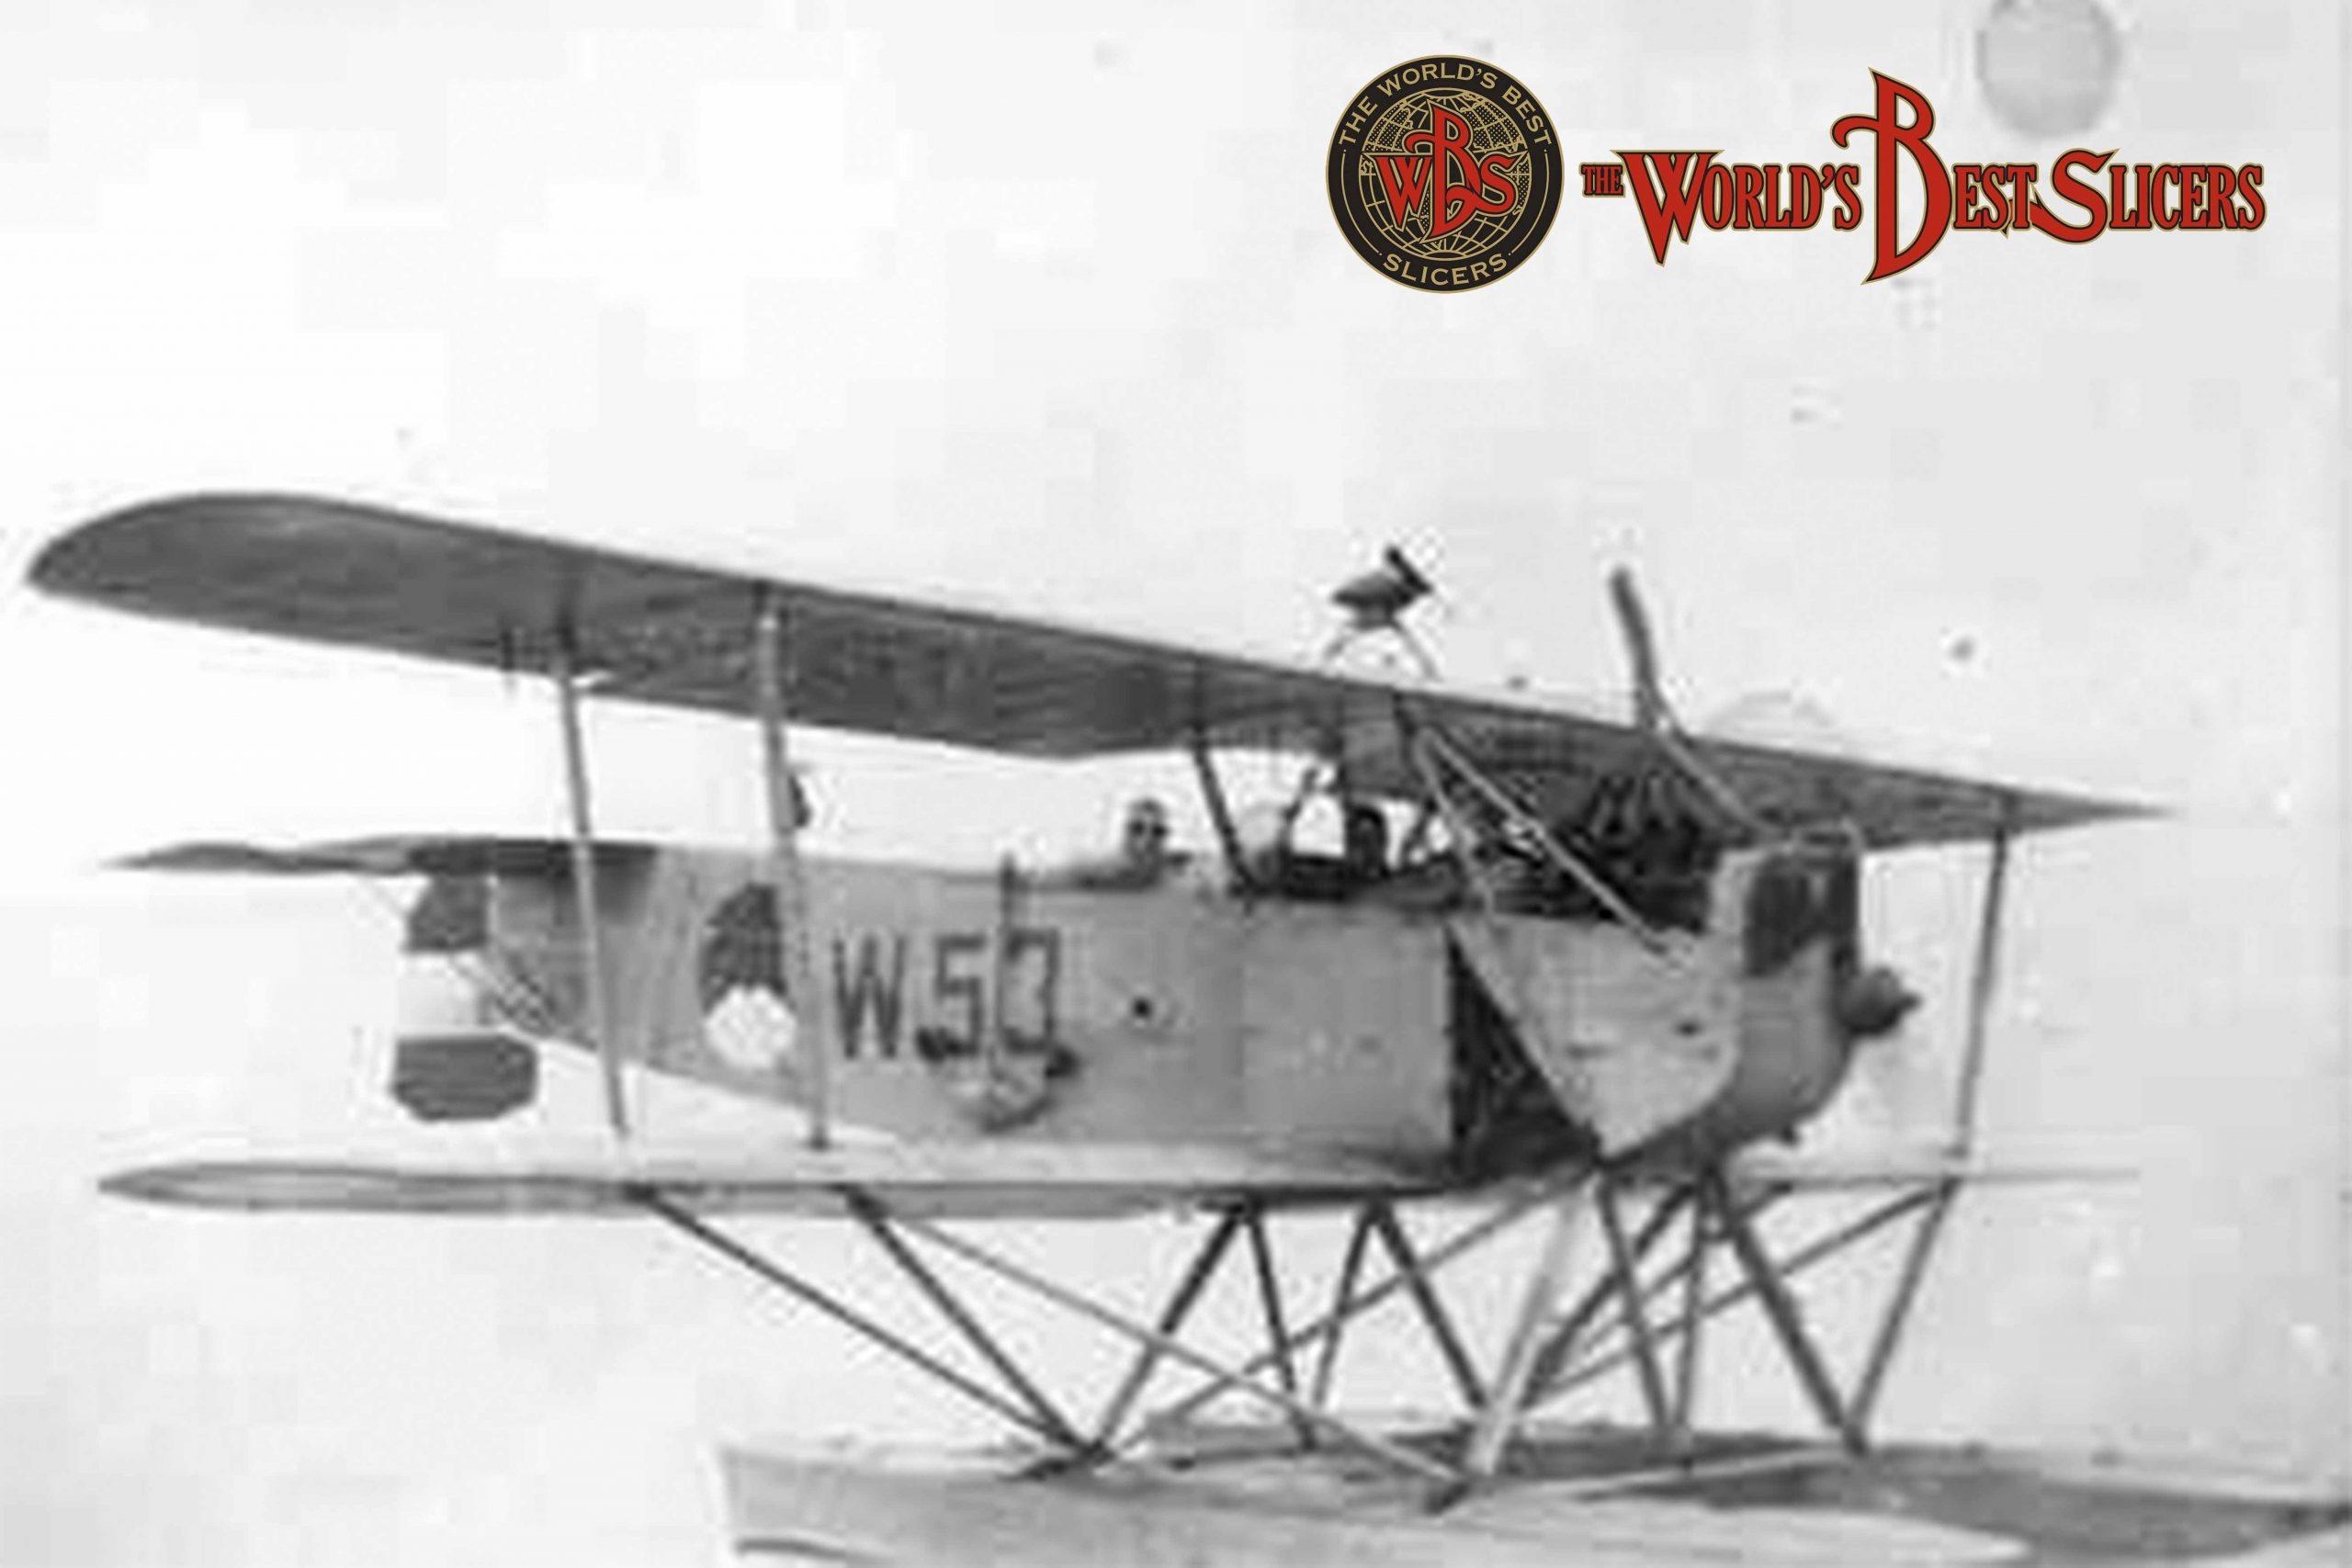 hp2-scaled W.A.Van Berkel's Geschichte